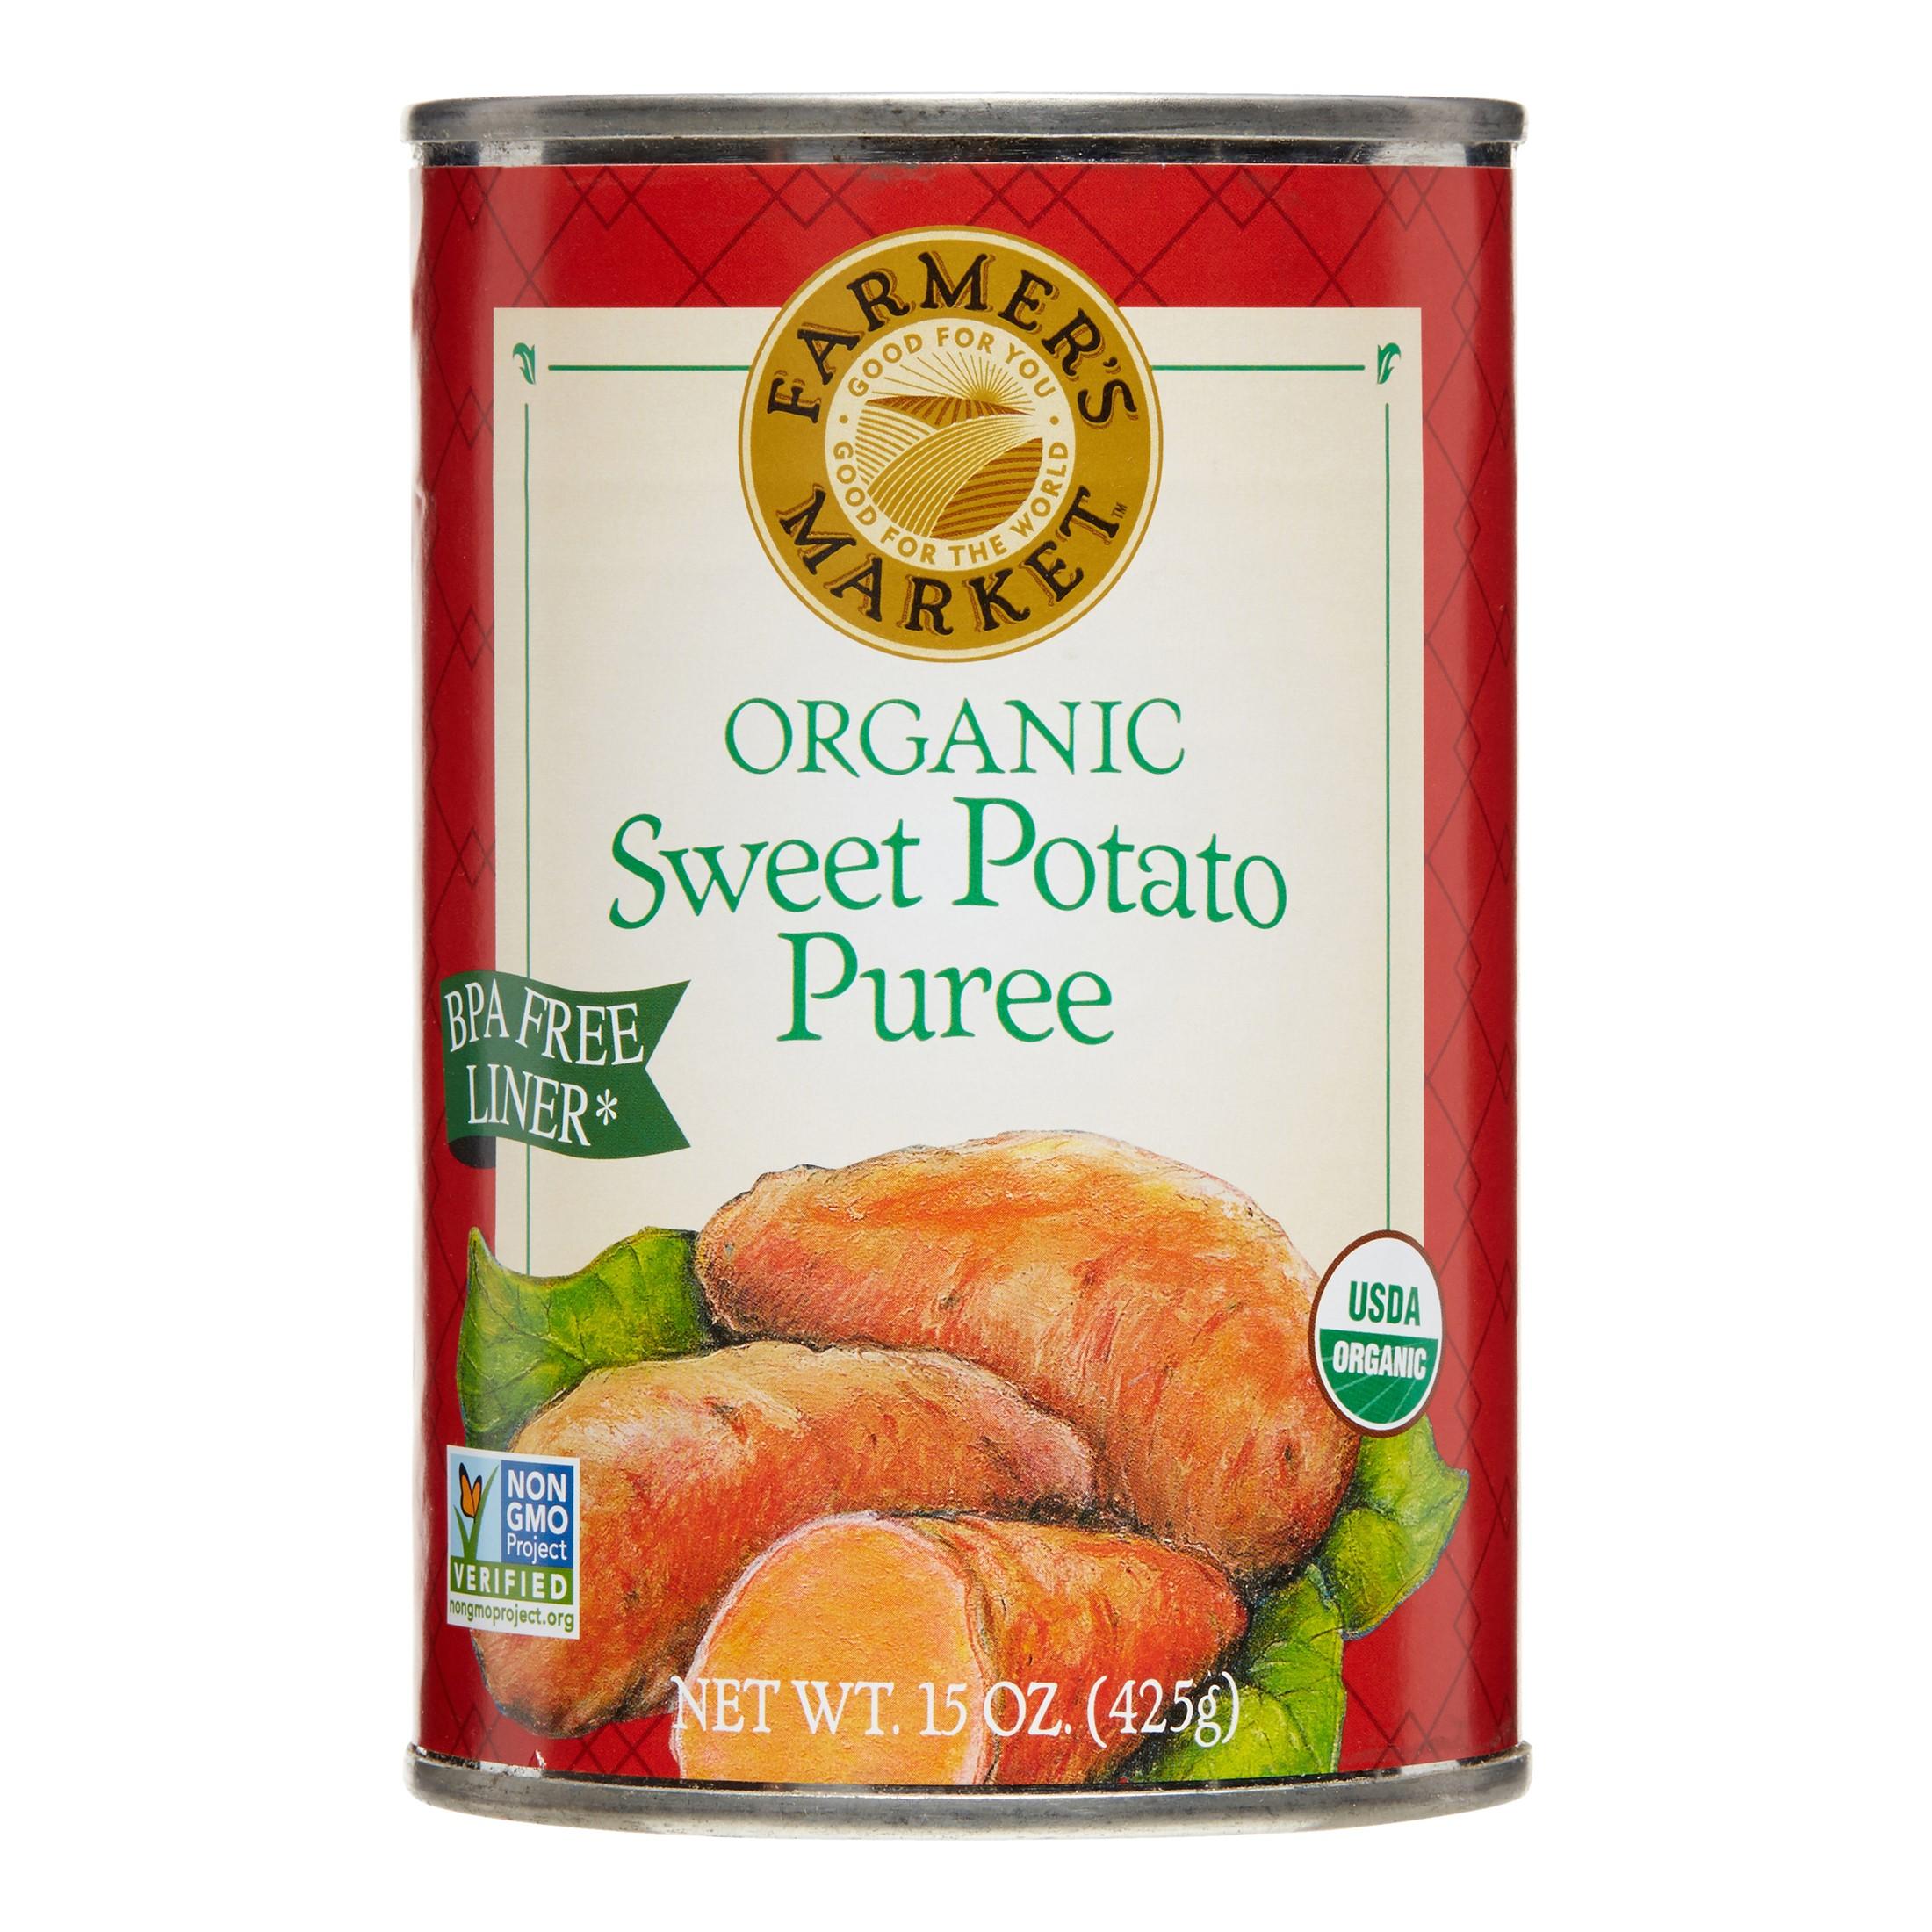 Farmers Market Canned Pure Sweet Potato (12x15 Oz)